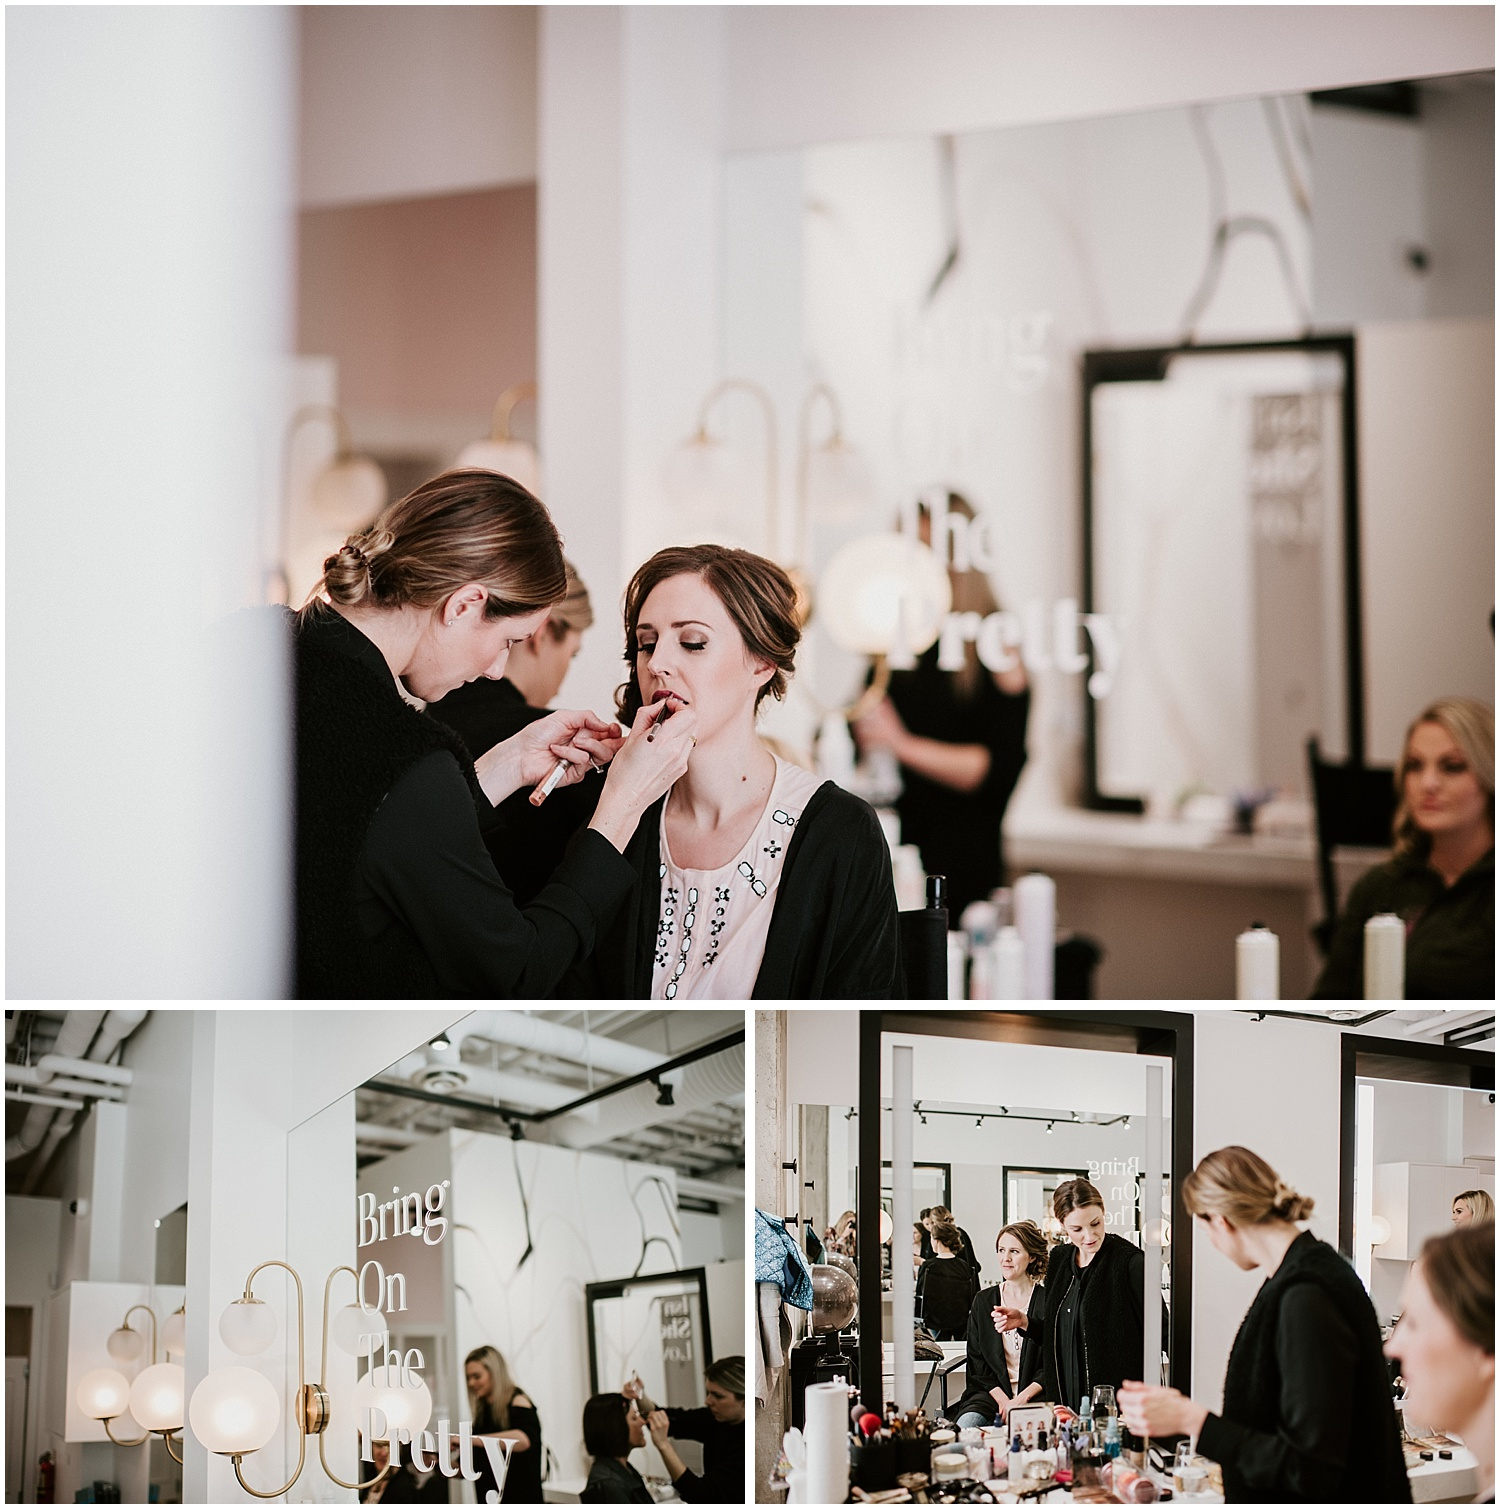 denise elliot getting ready wedding photography stacie carr makeup artist intimate wedding portrait